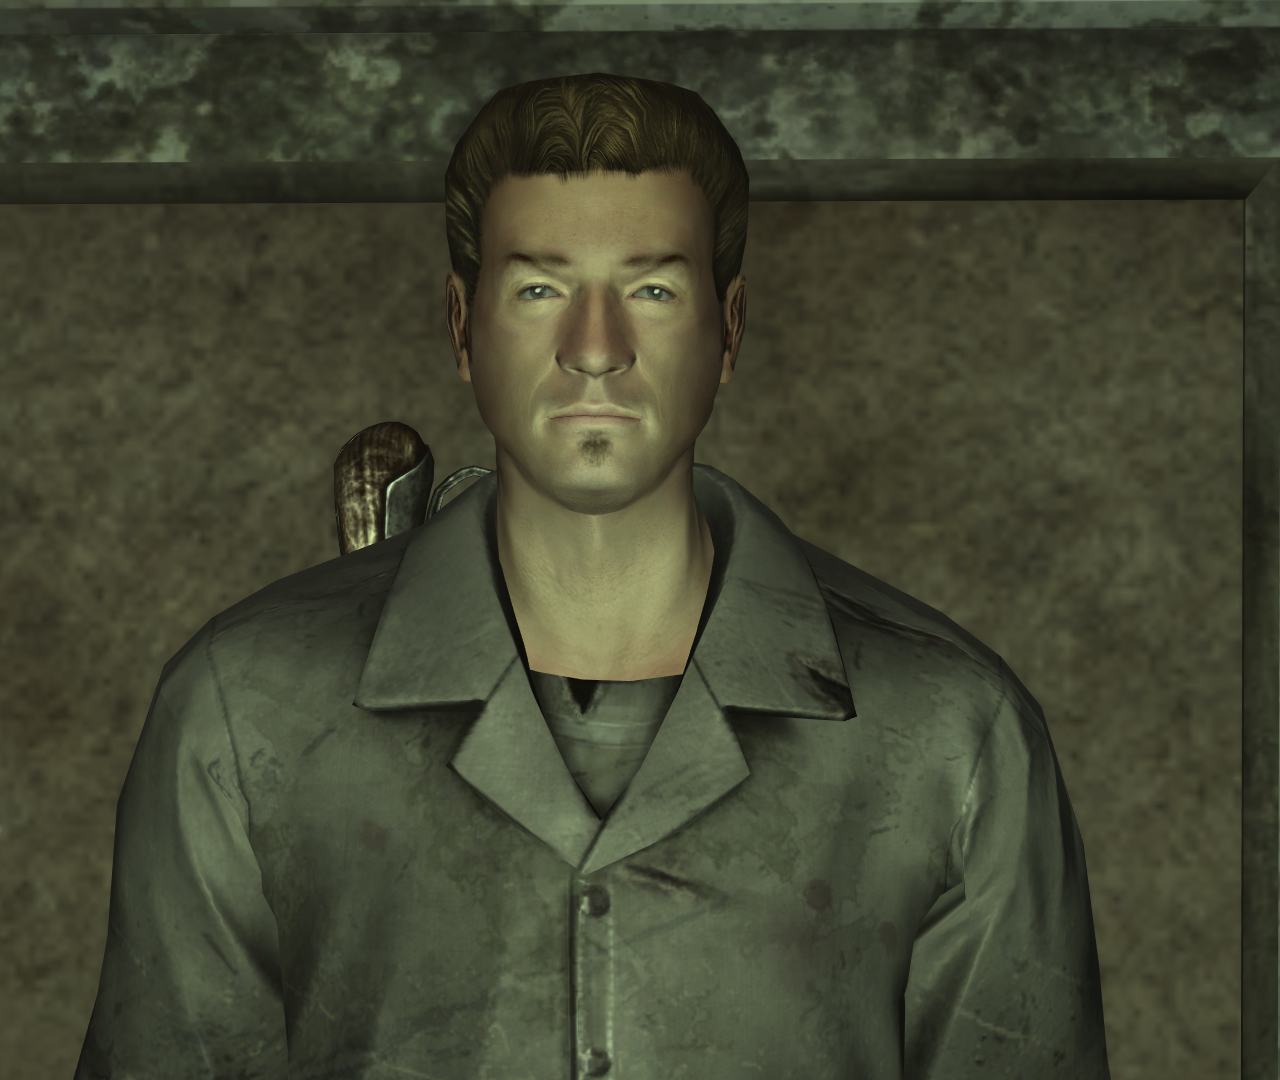 Mick (Fallout: New Vegas)